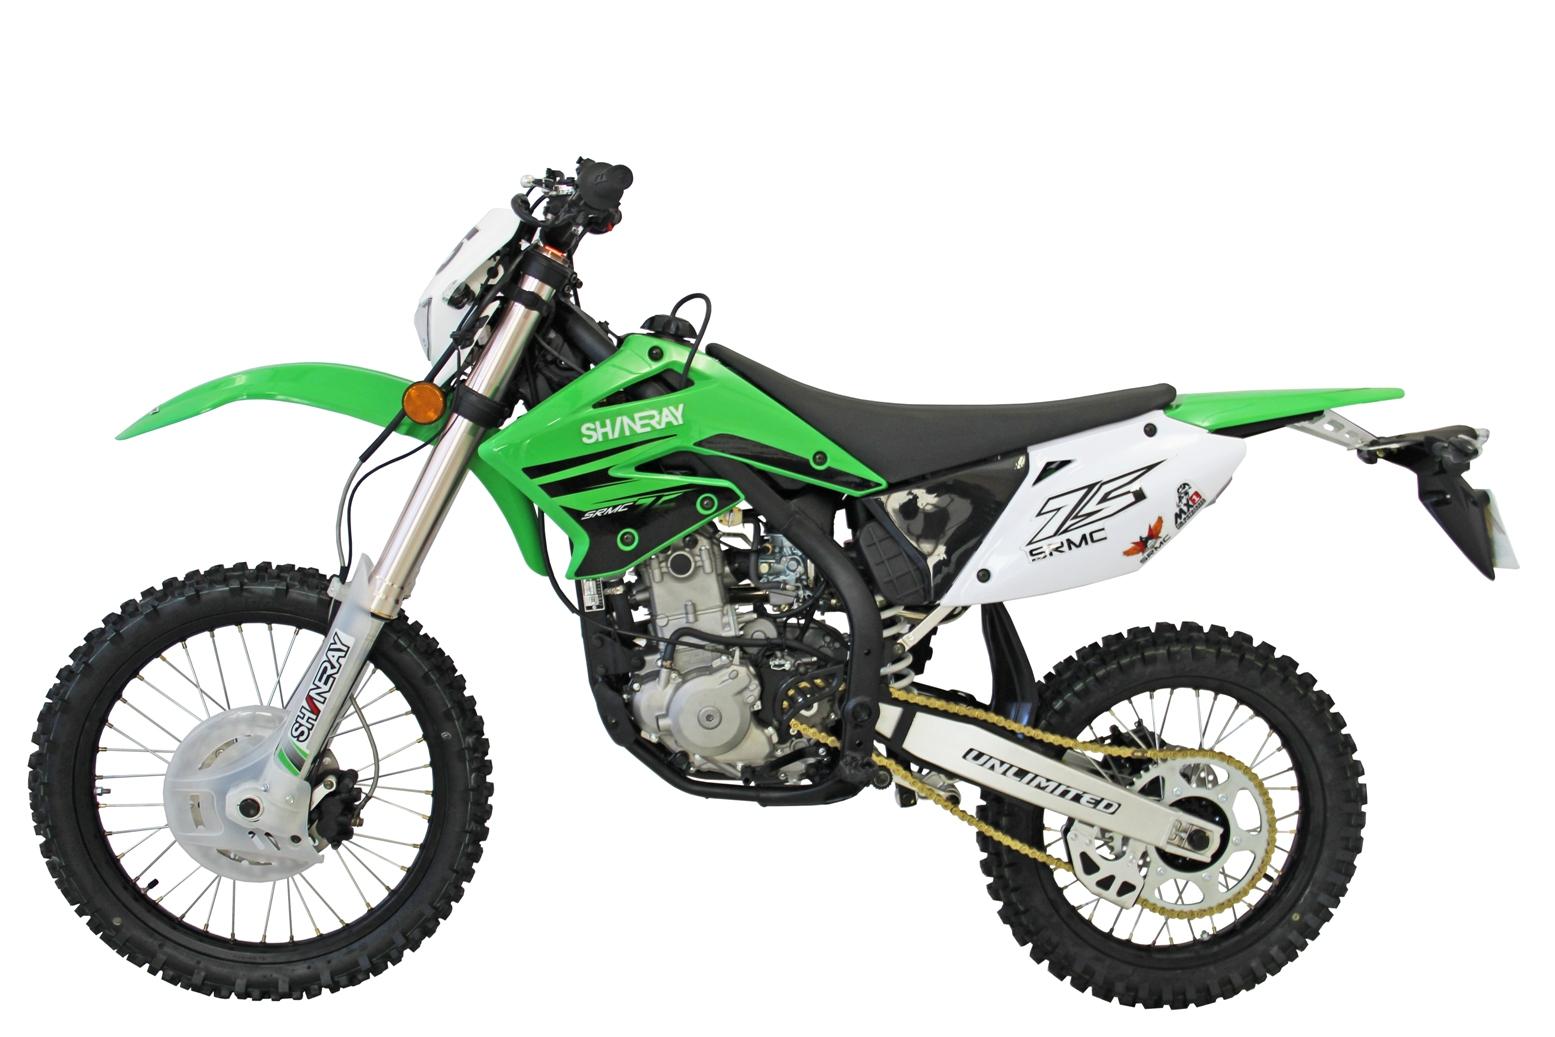 МОТОЦИКЛ SHINERAY XY 250GY-7 (X6) Green  Артмото - купить квадроцикл в украине и харькове, мотоцикл, снегоход, скутер, мопед, электромобиль